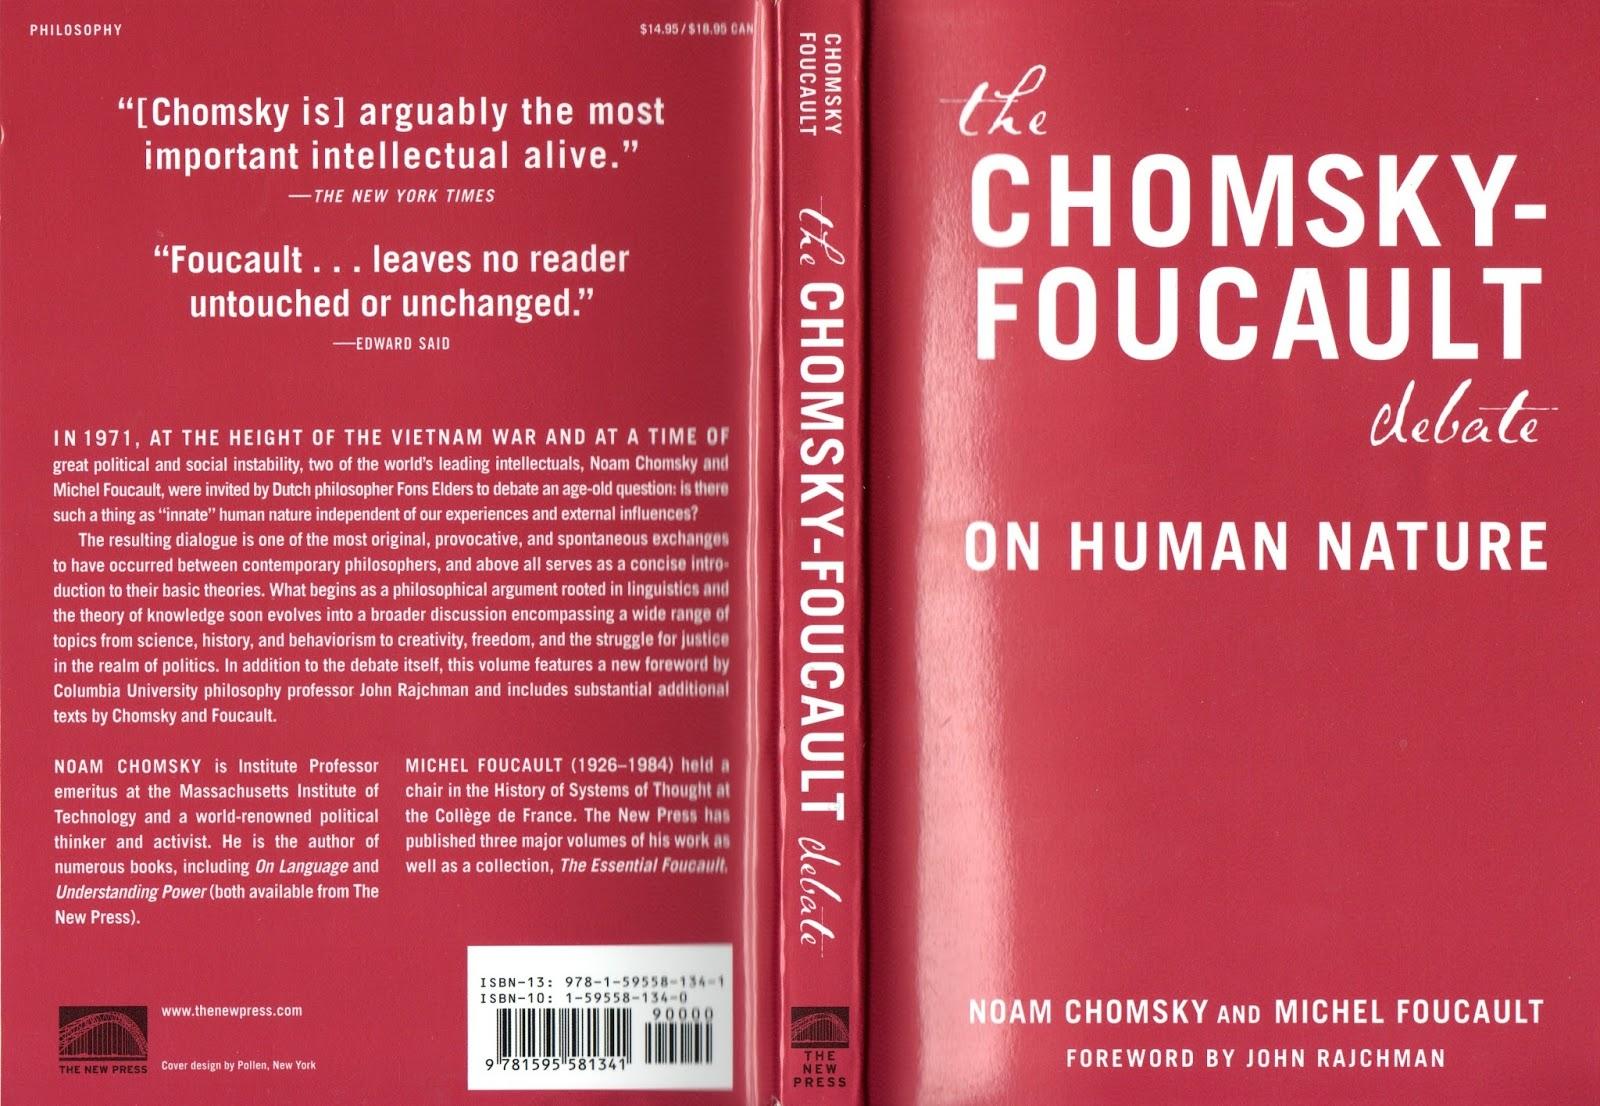 72bba pages2bde2bchomsky2b 2bfoucault2bdebate - The Chomsky-Foucault debate on Human Nature PDF - Noam Chomsky and Michel Foucault